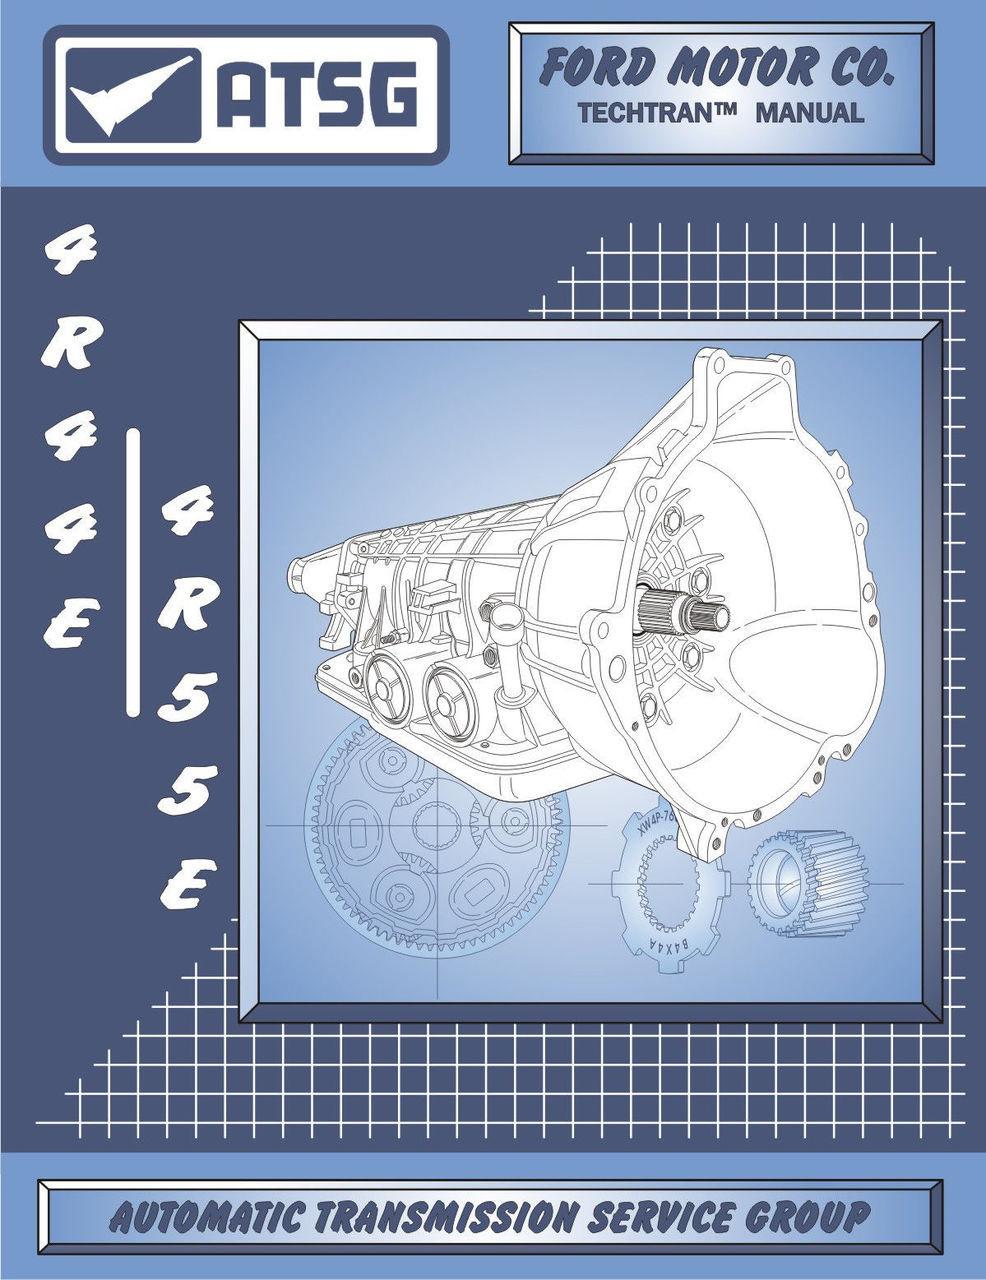 ATSG Tech Manual 4R44E 4R55E A4LDE Ford Mazda Mercury Rebuild Guide Book  1995-On - CT Powertrain Products